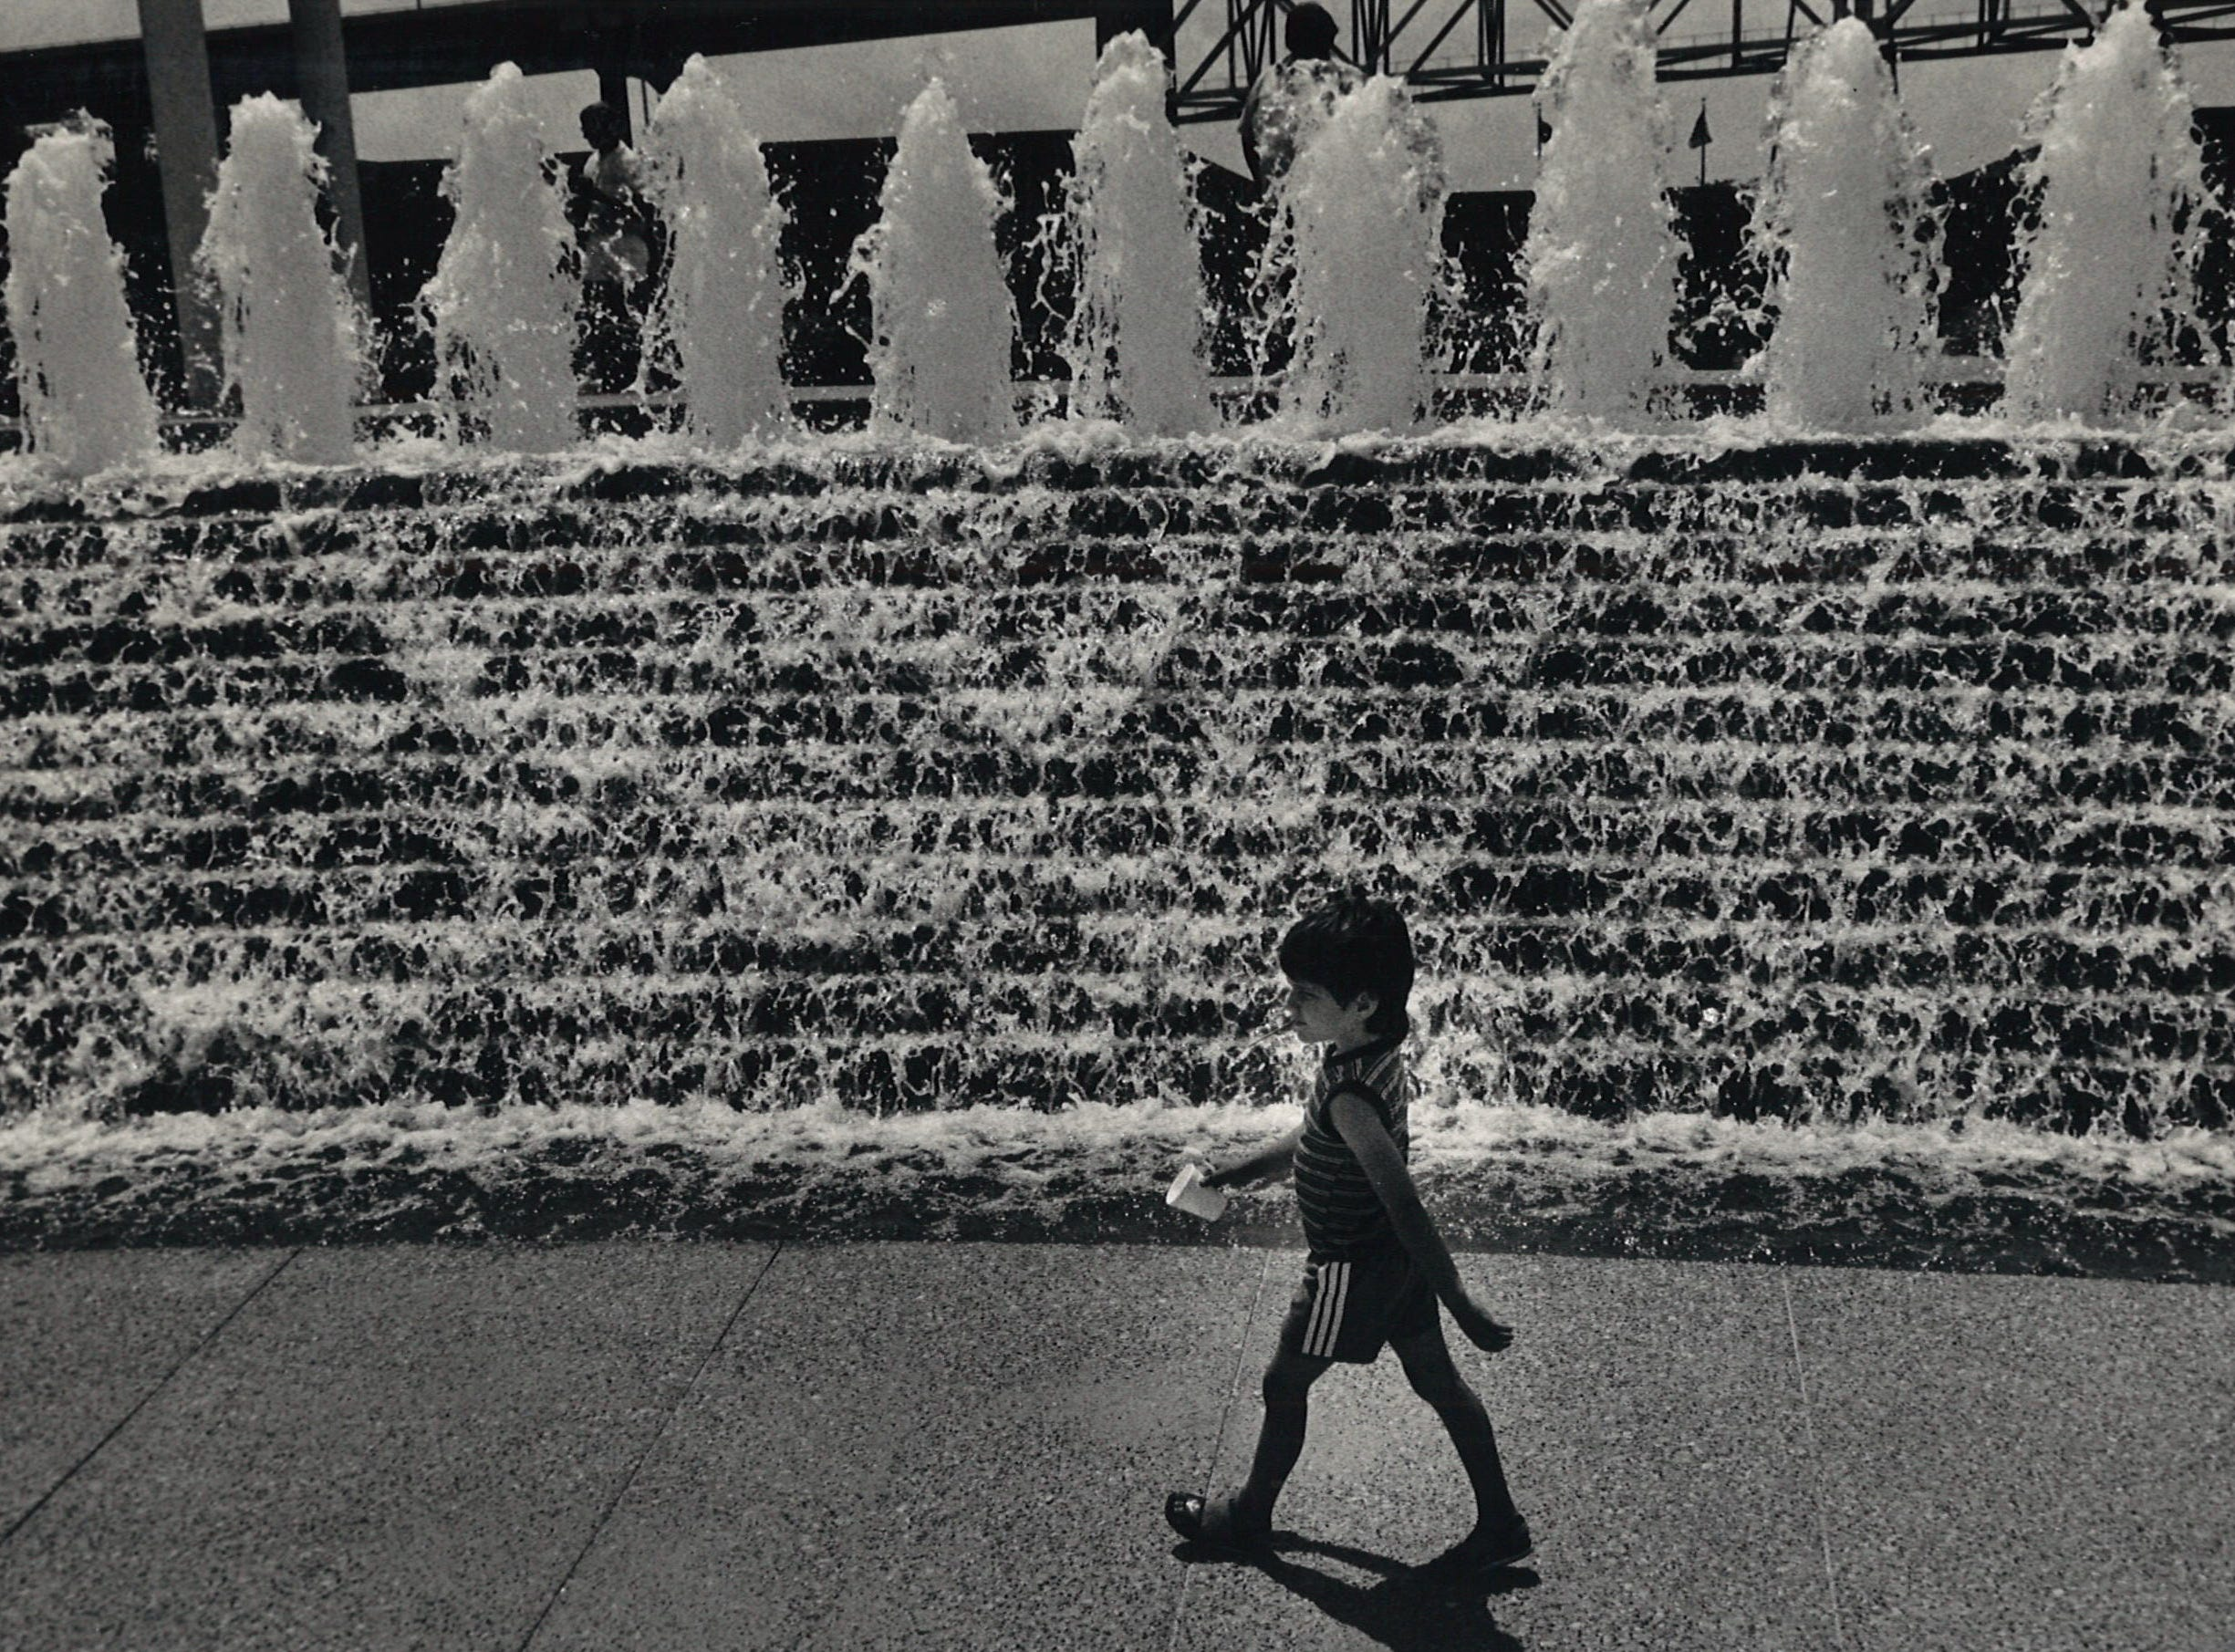 Water flows through the fountain at the Corpus Christi Watergarden as Calvin Hamilton, 6, walks by on June 14, 1988.